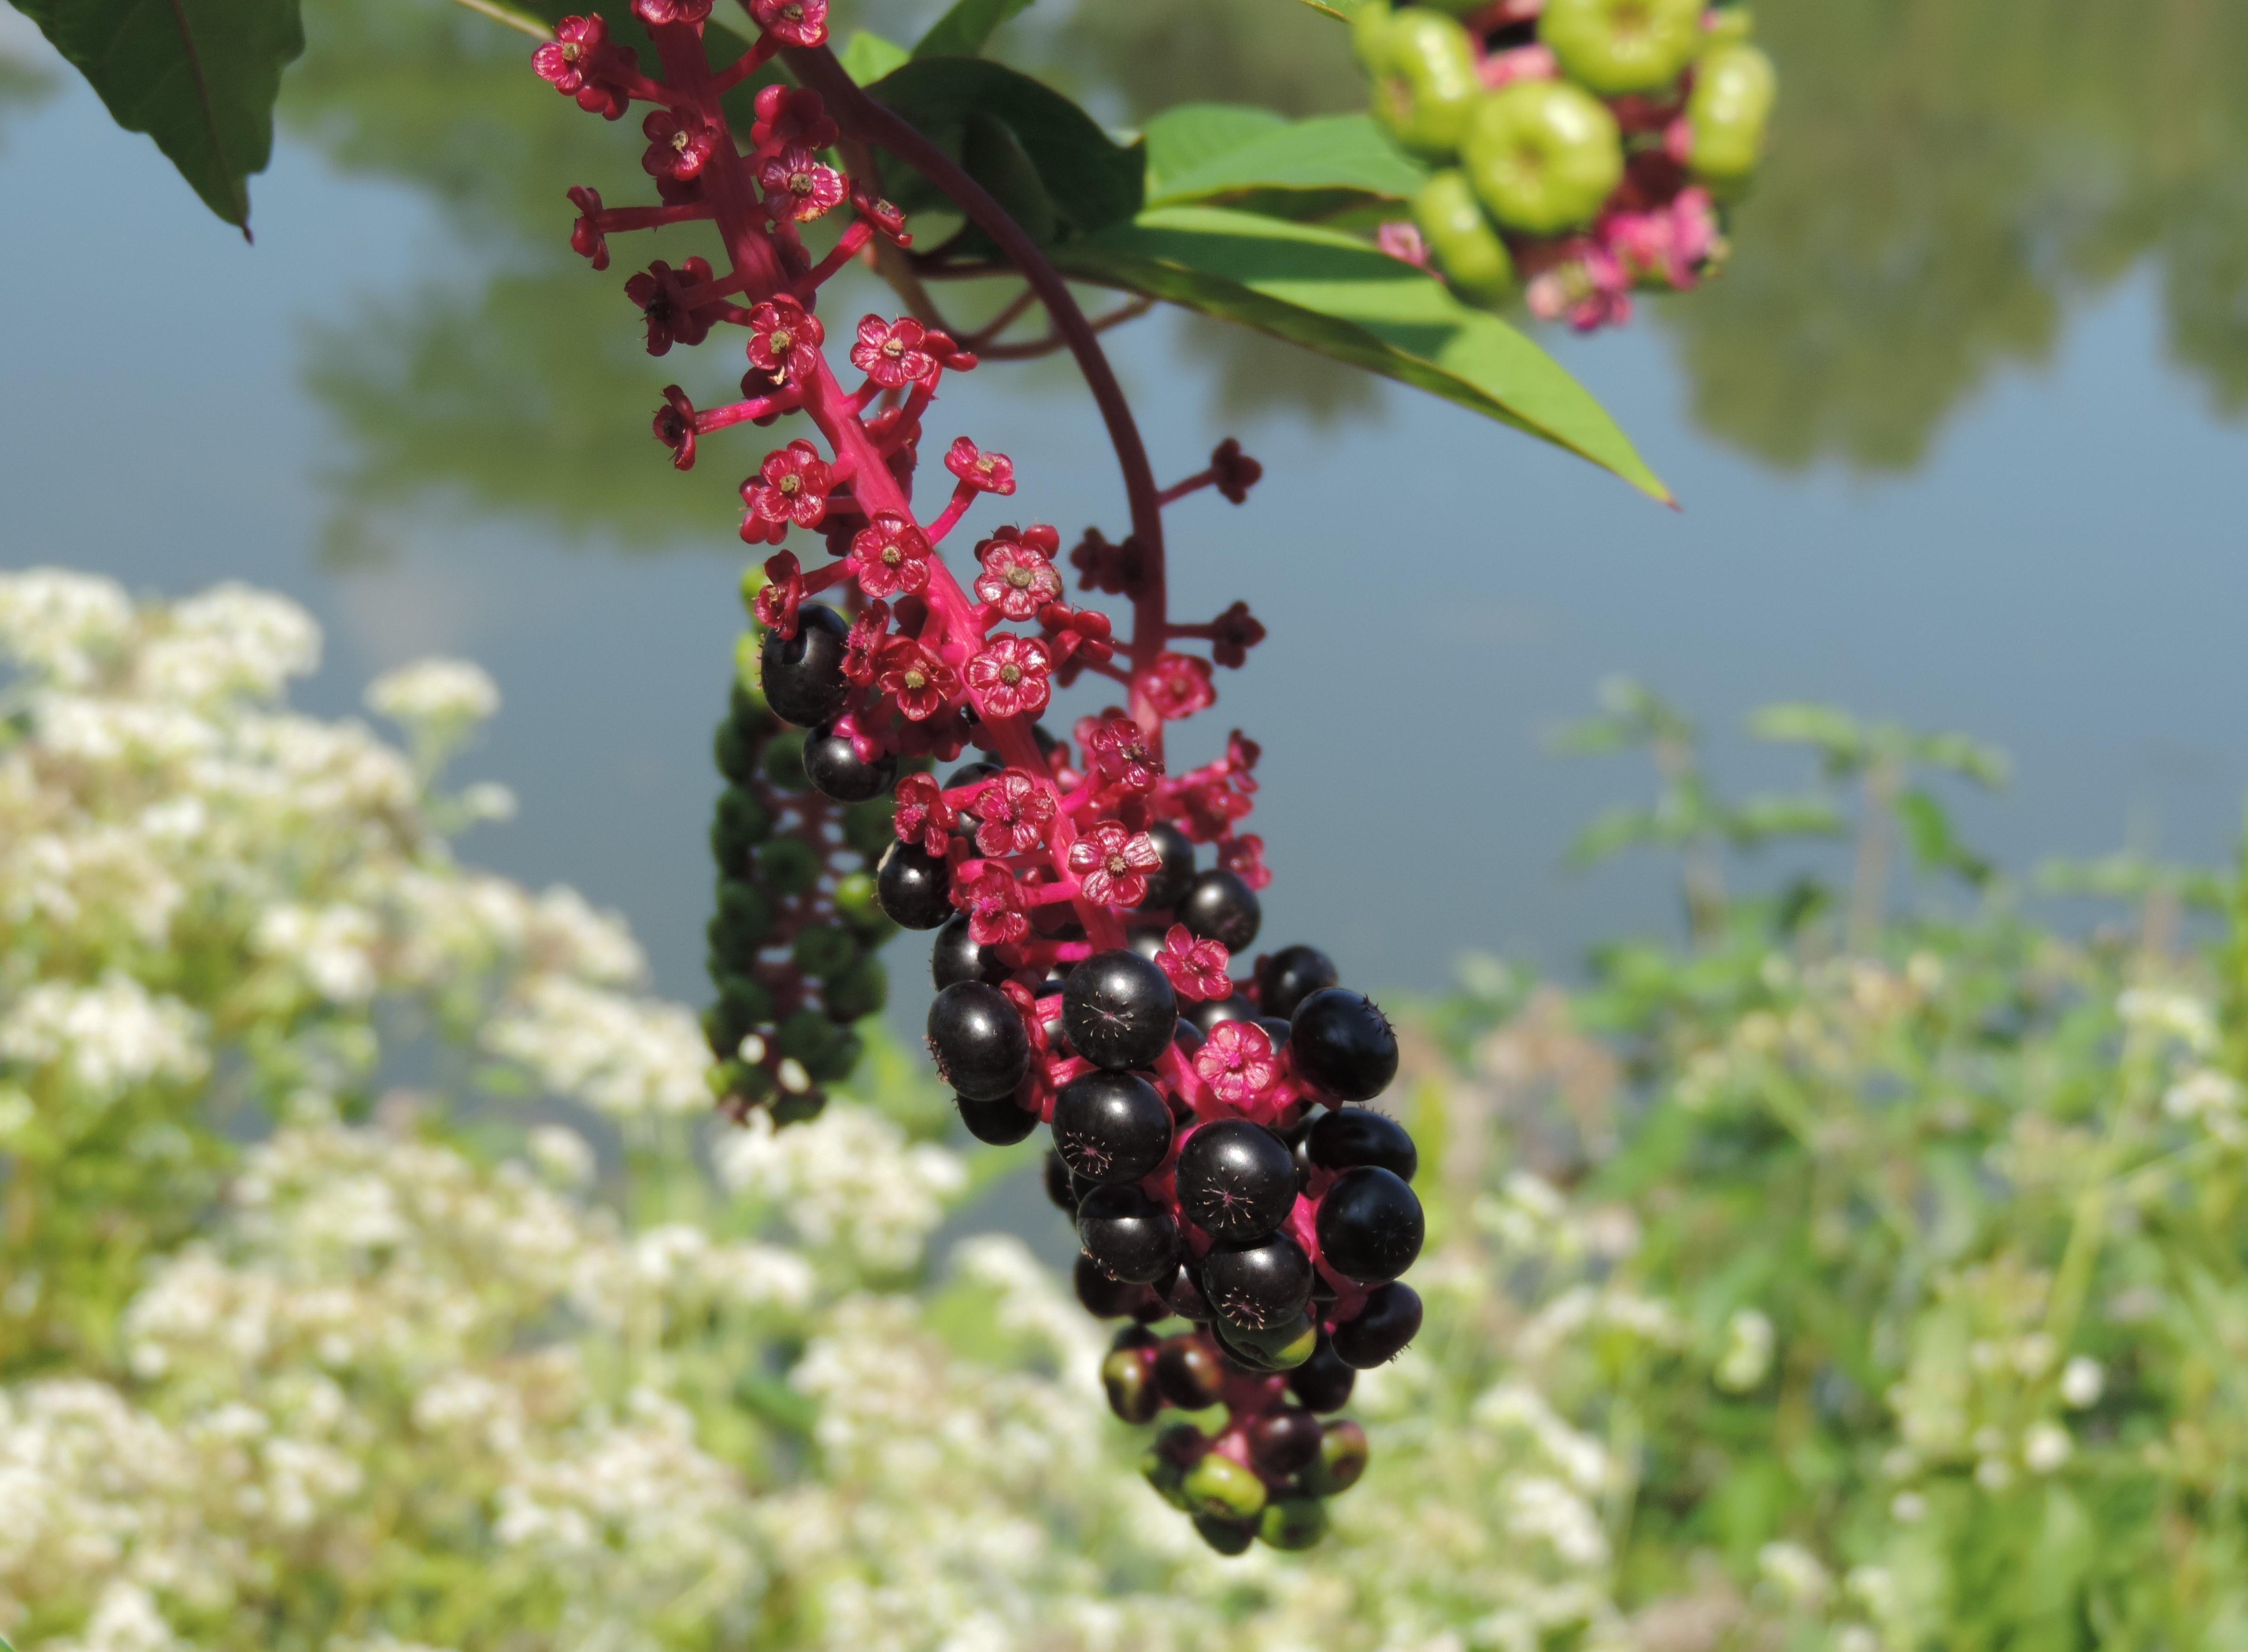 Purple and pink pokeweed berries